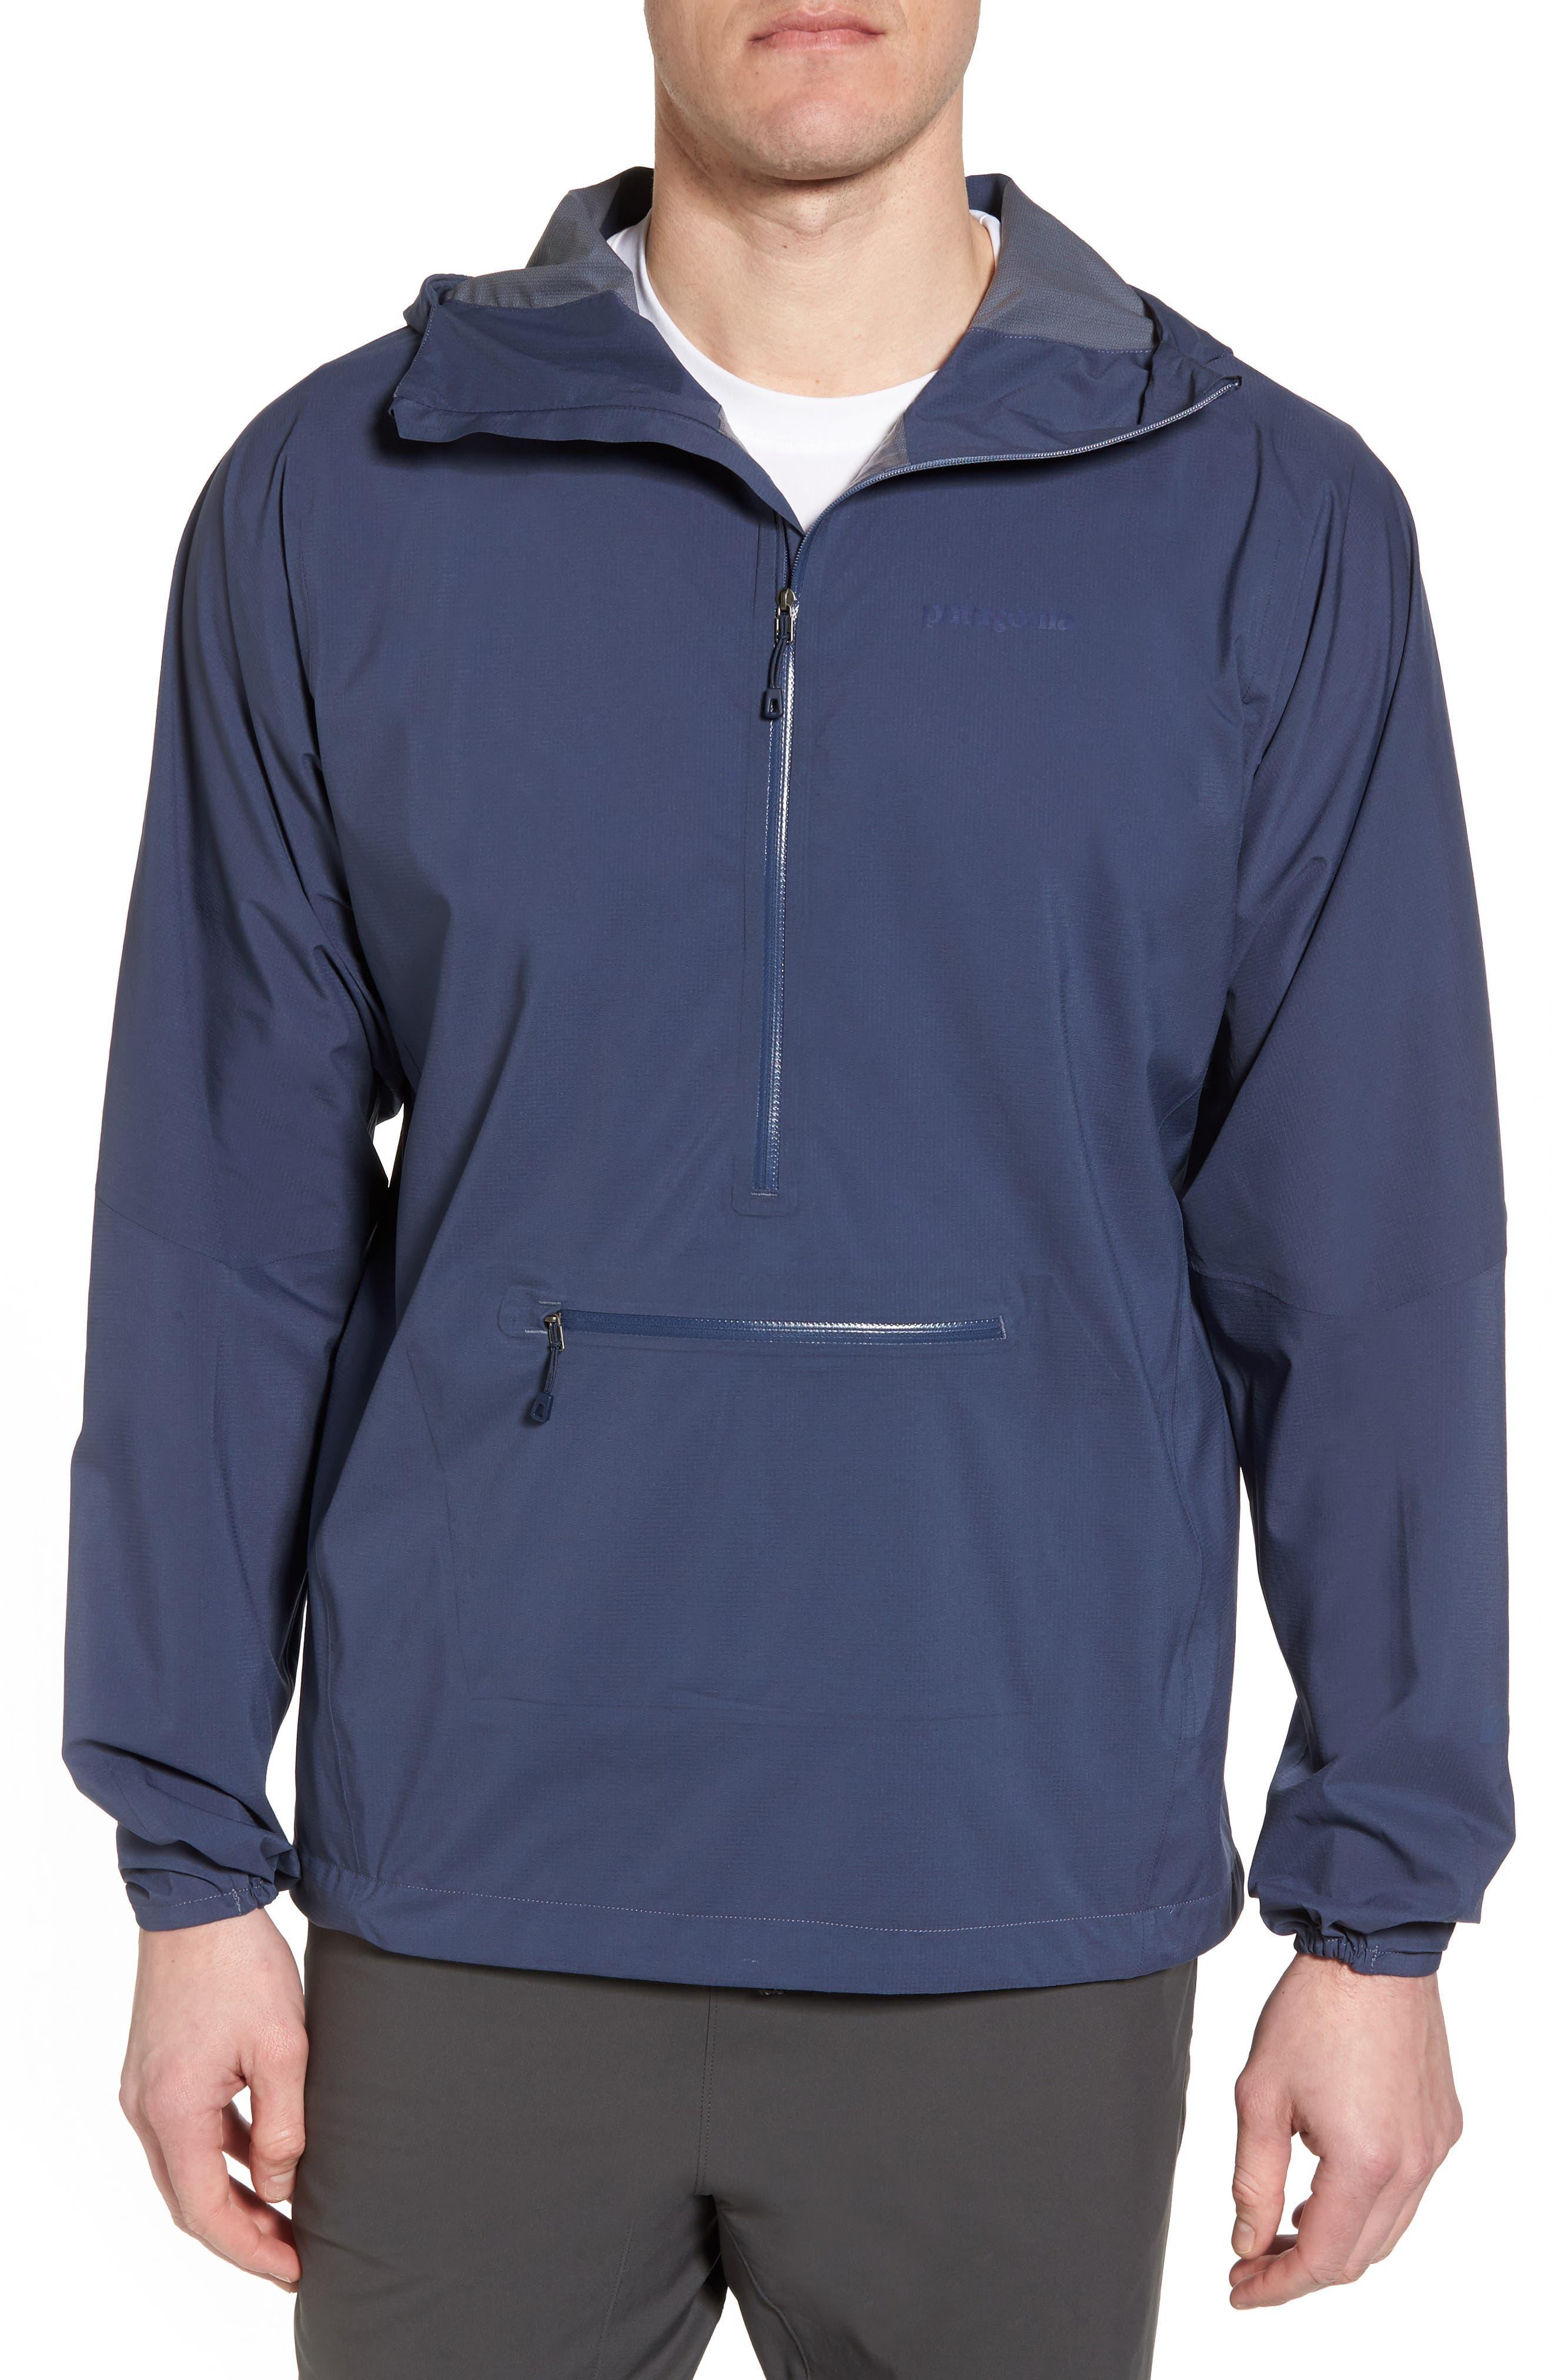 Stretch Rainshadow Jacket,                         Main,                         color, Dolomite Blue